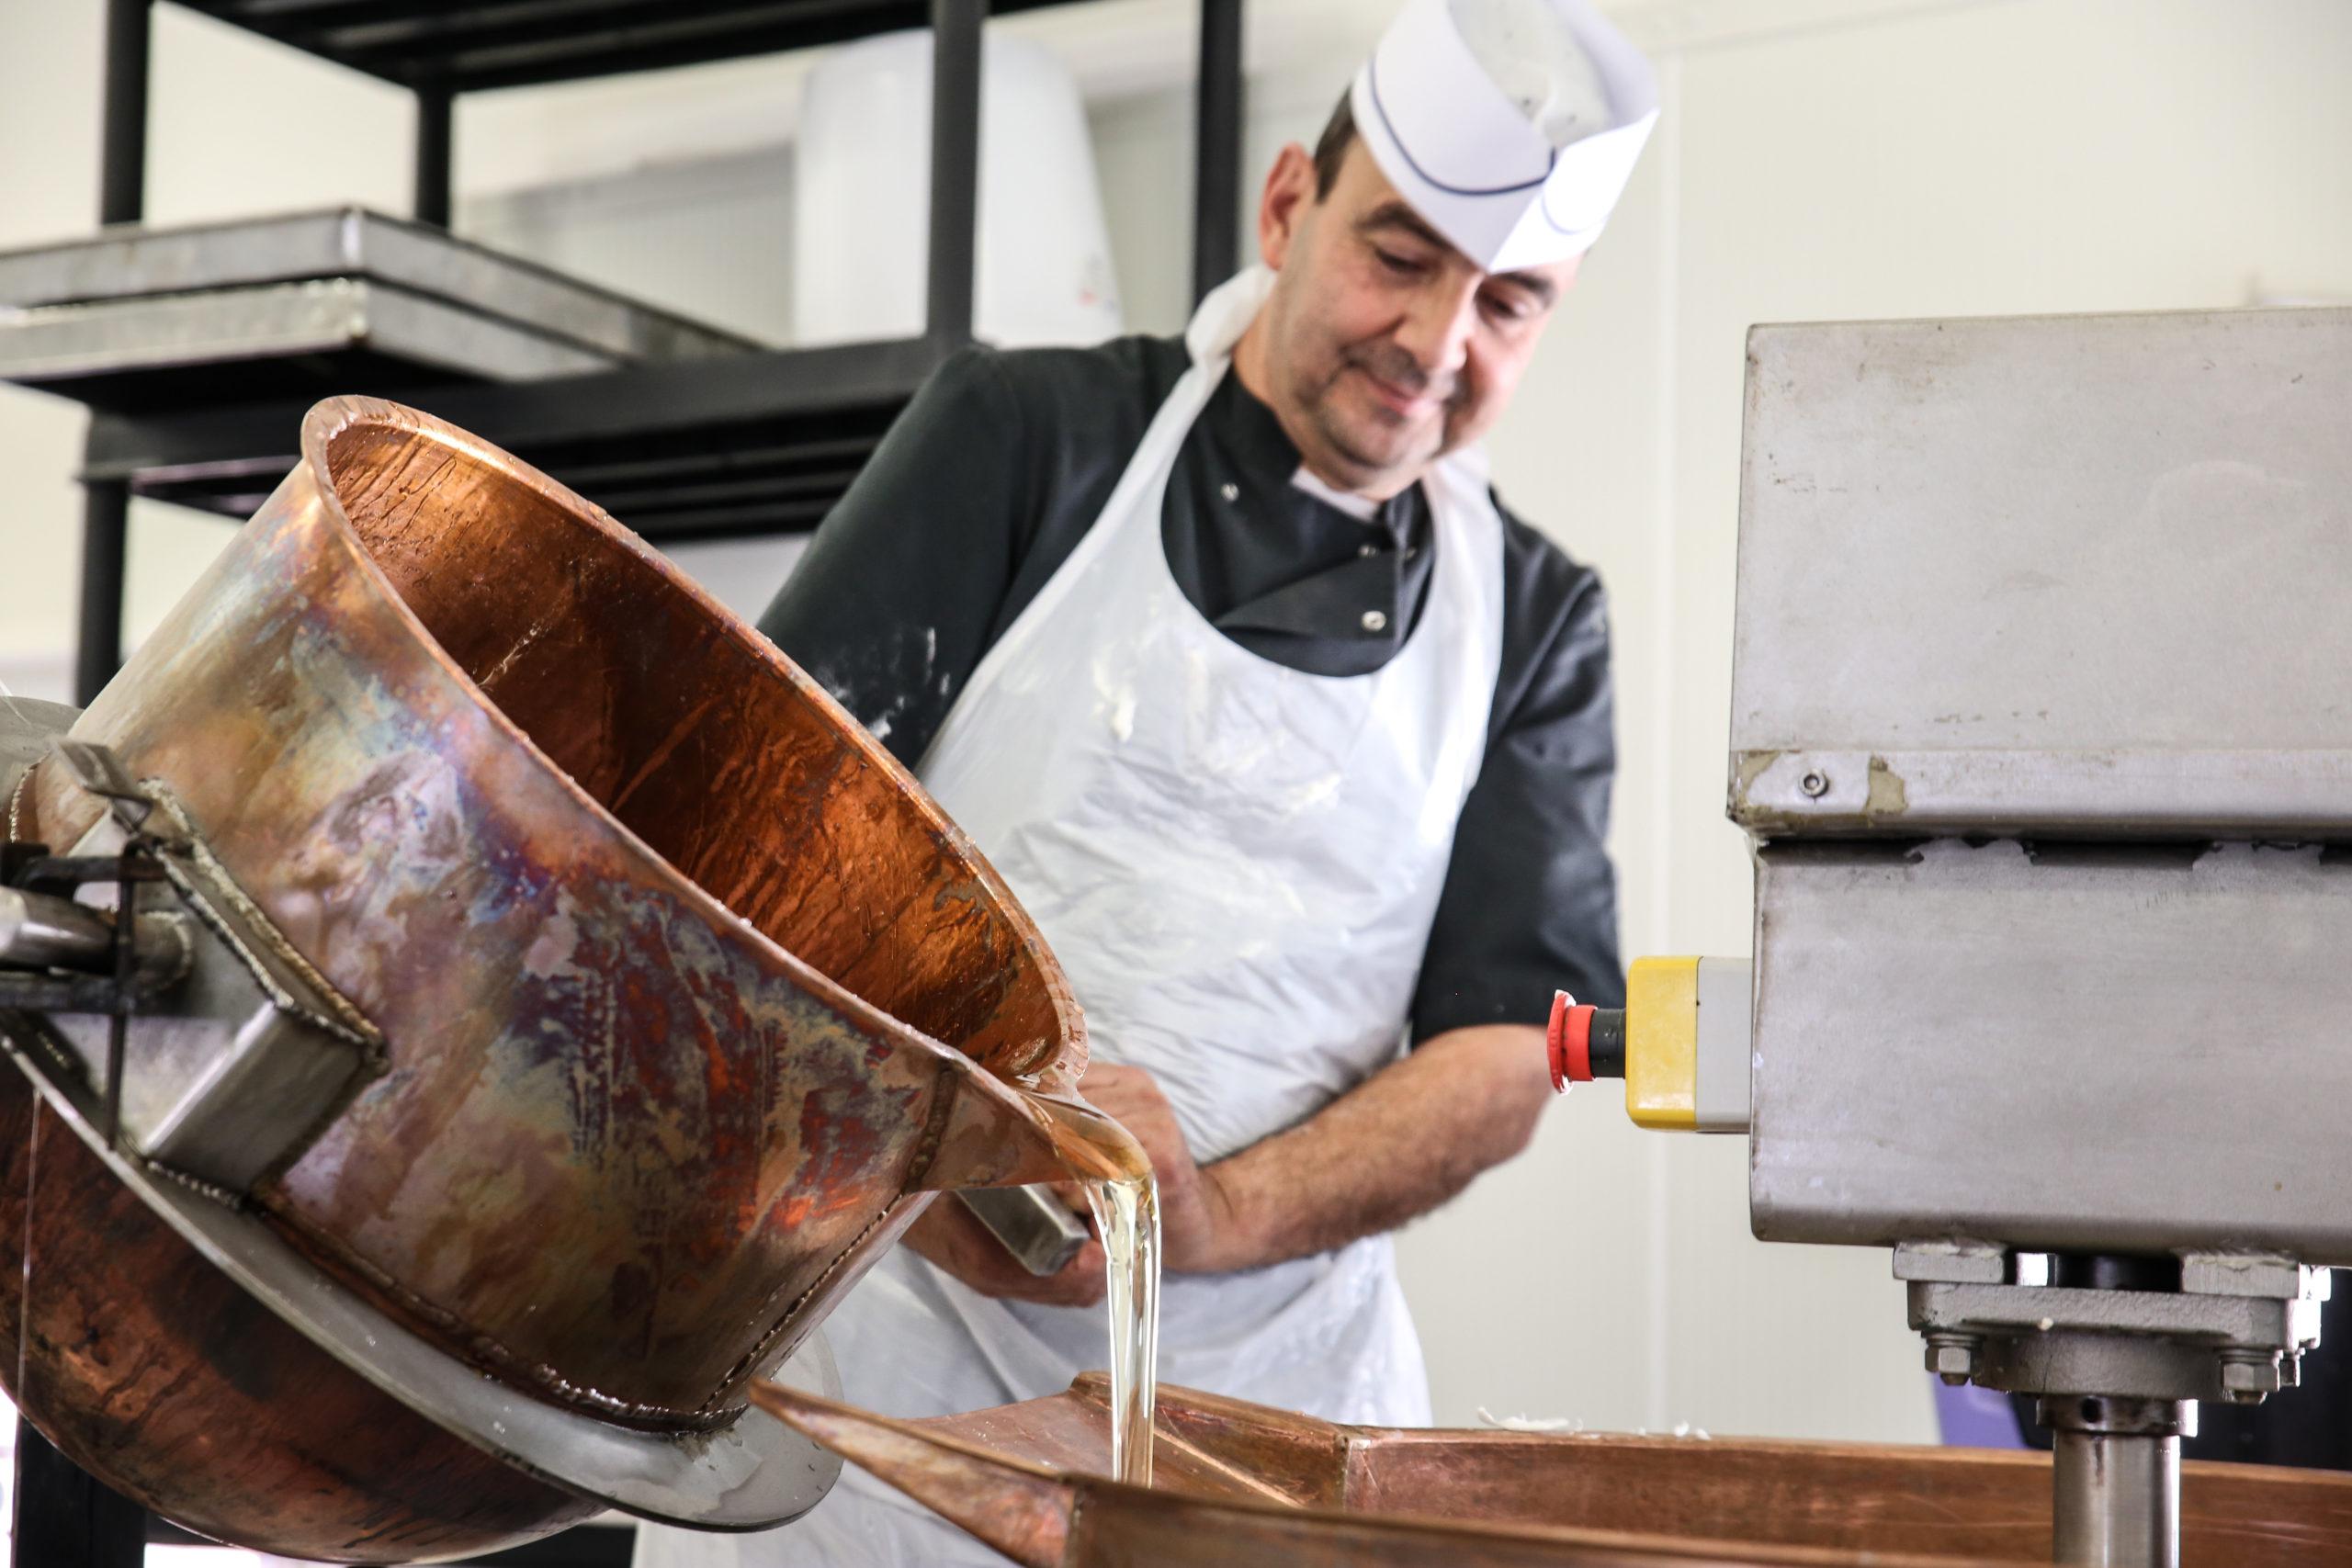 fabrication nougat maison provence amande miel